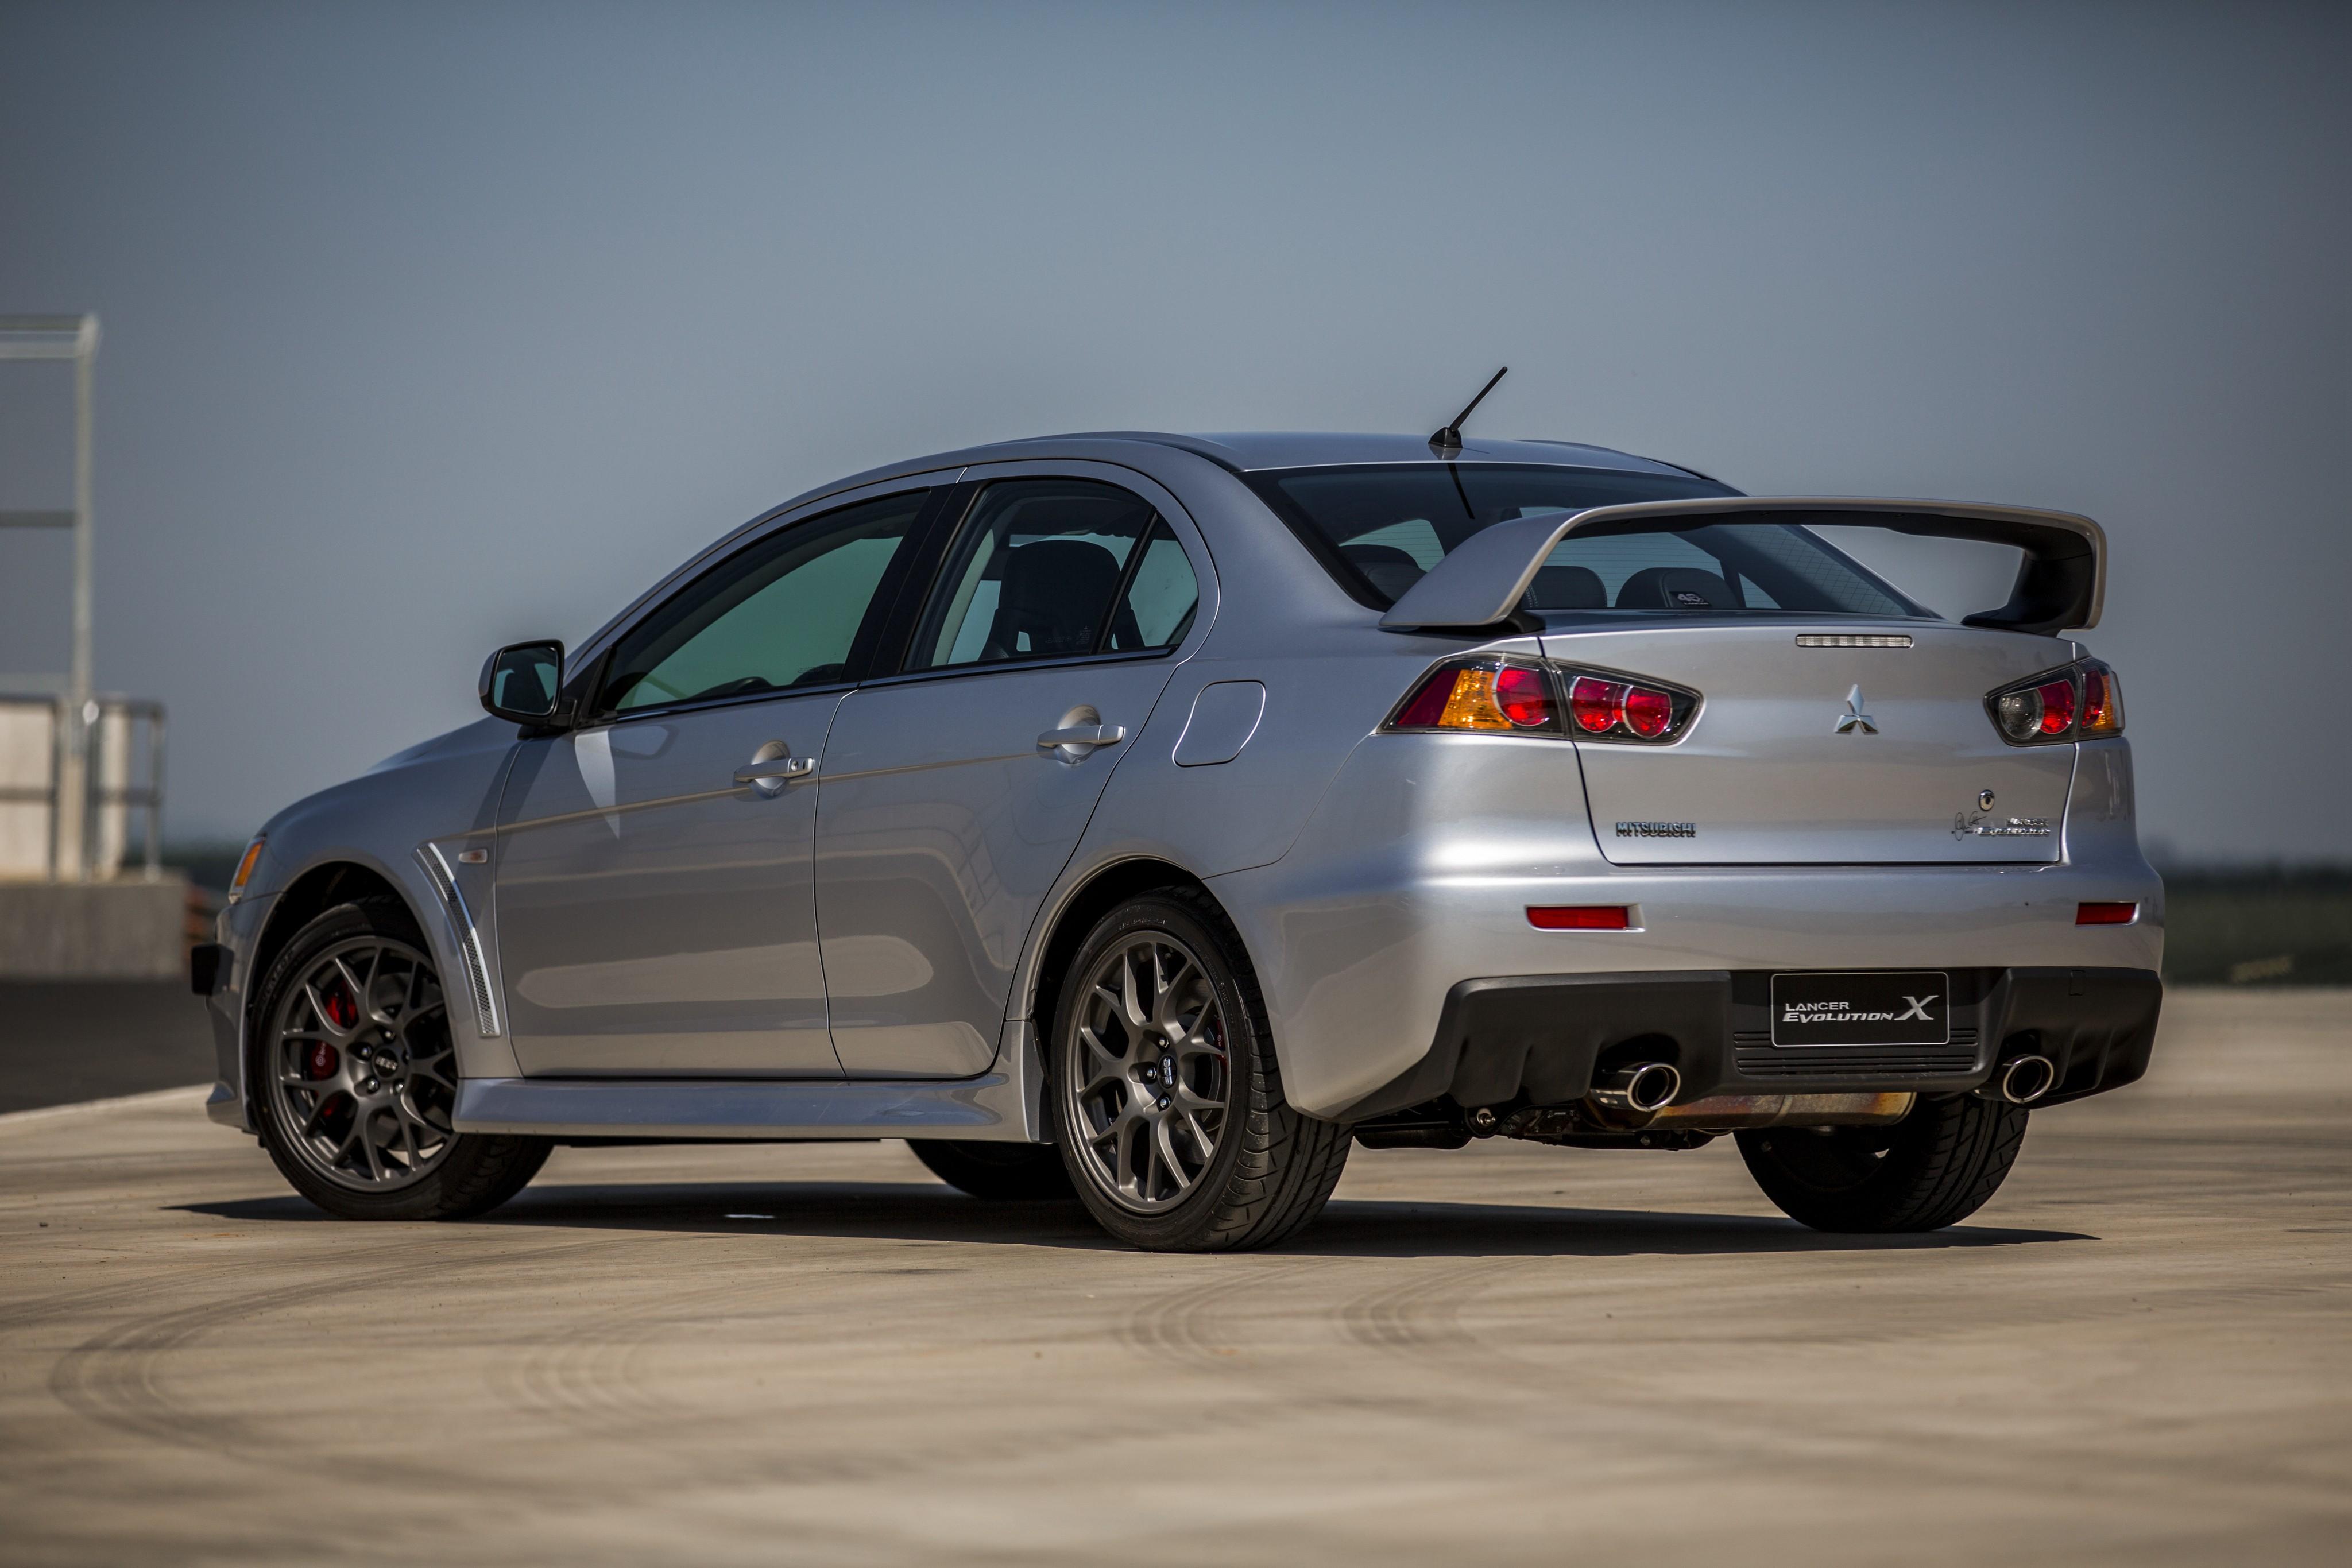 Mitsubishi lancer evolution x фото